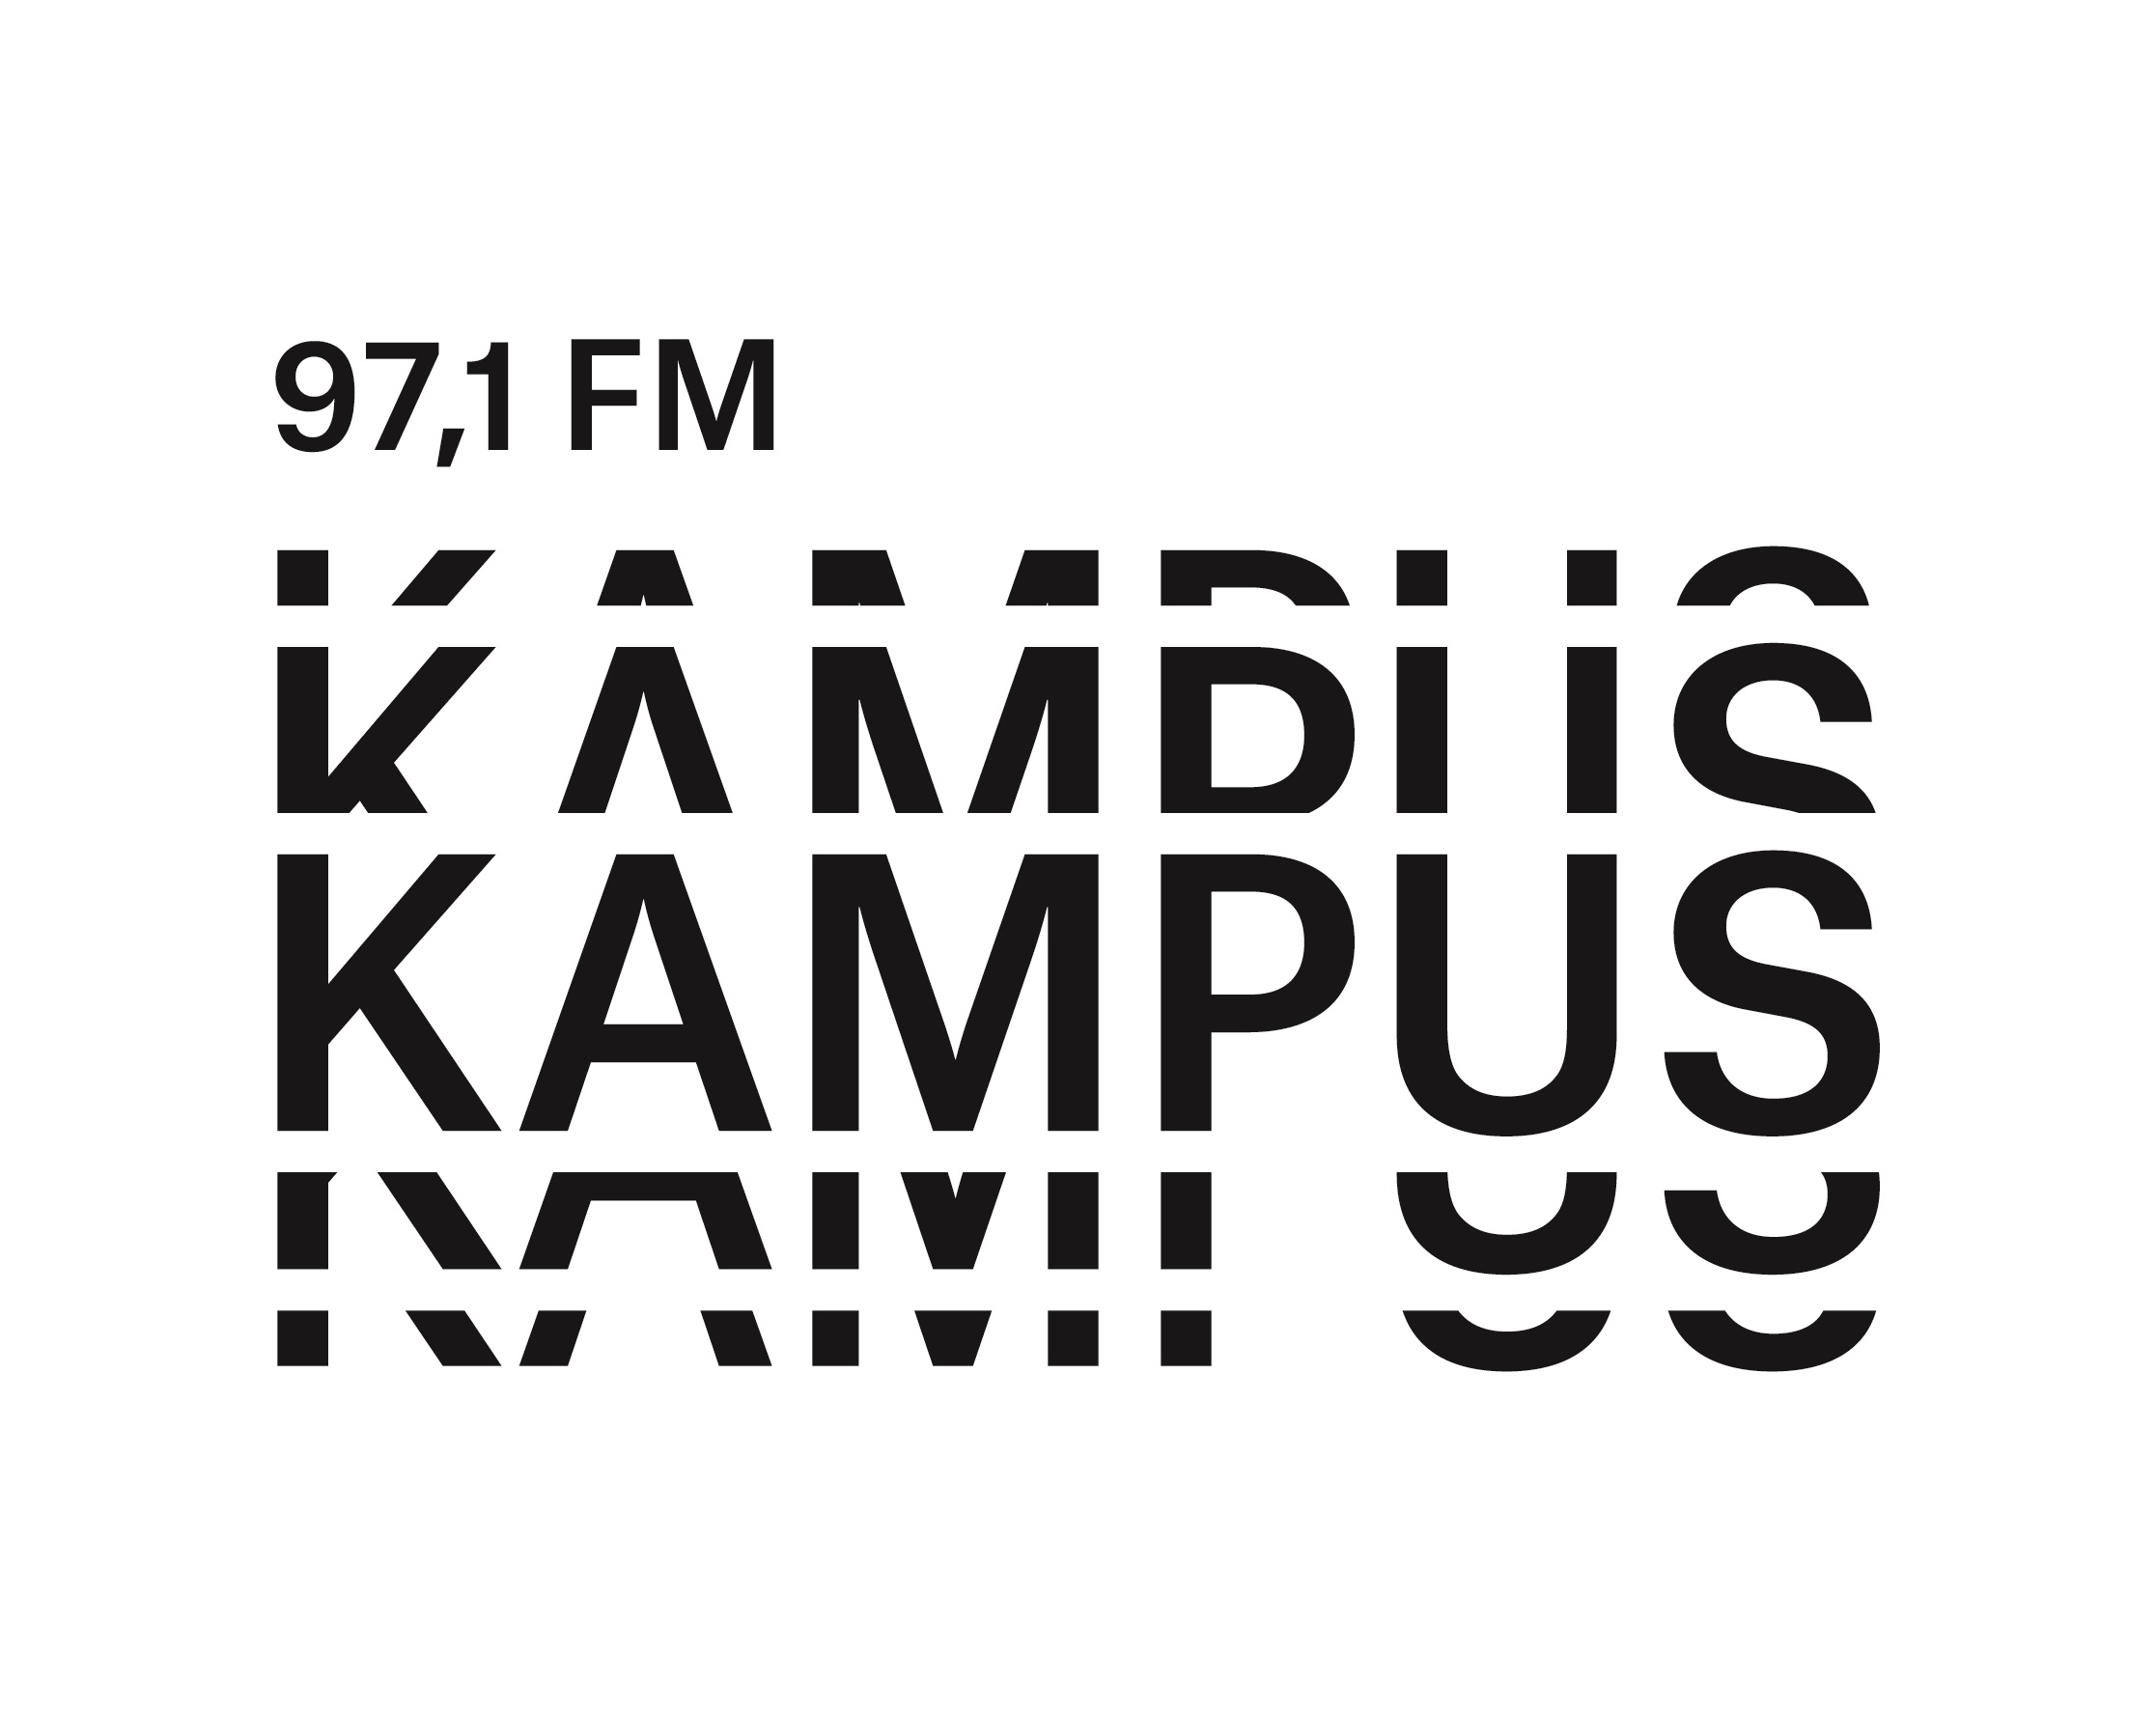 KAMPUS_niebieski